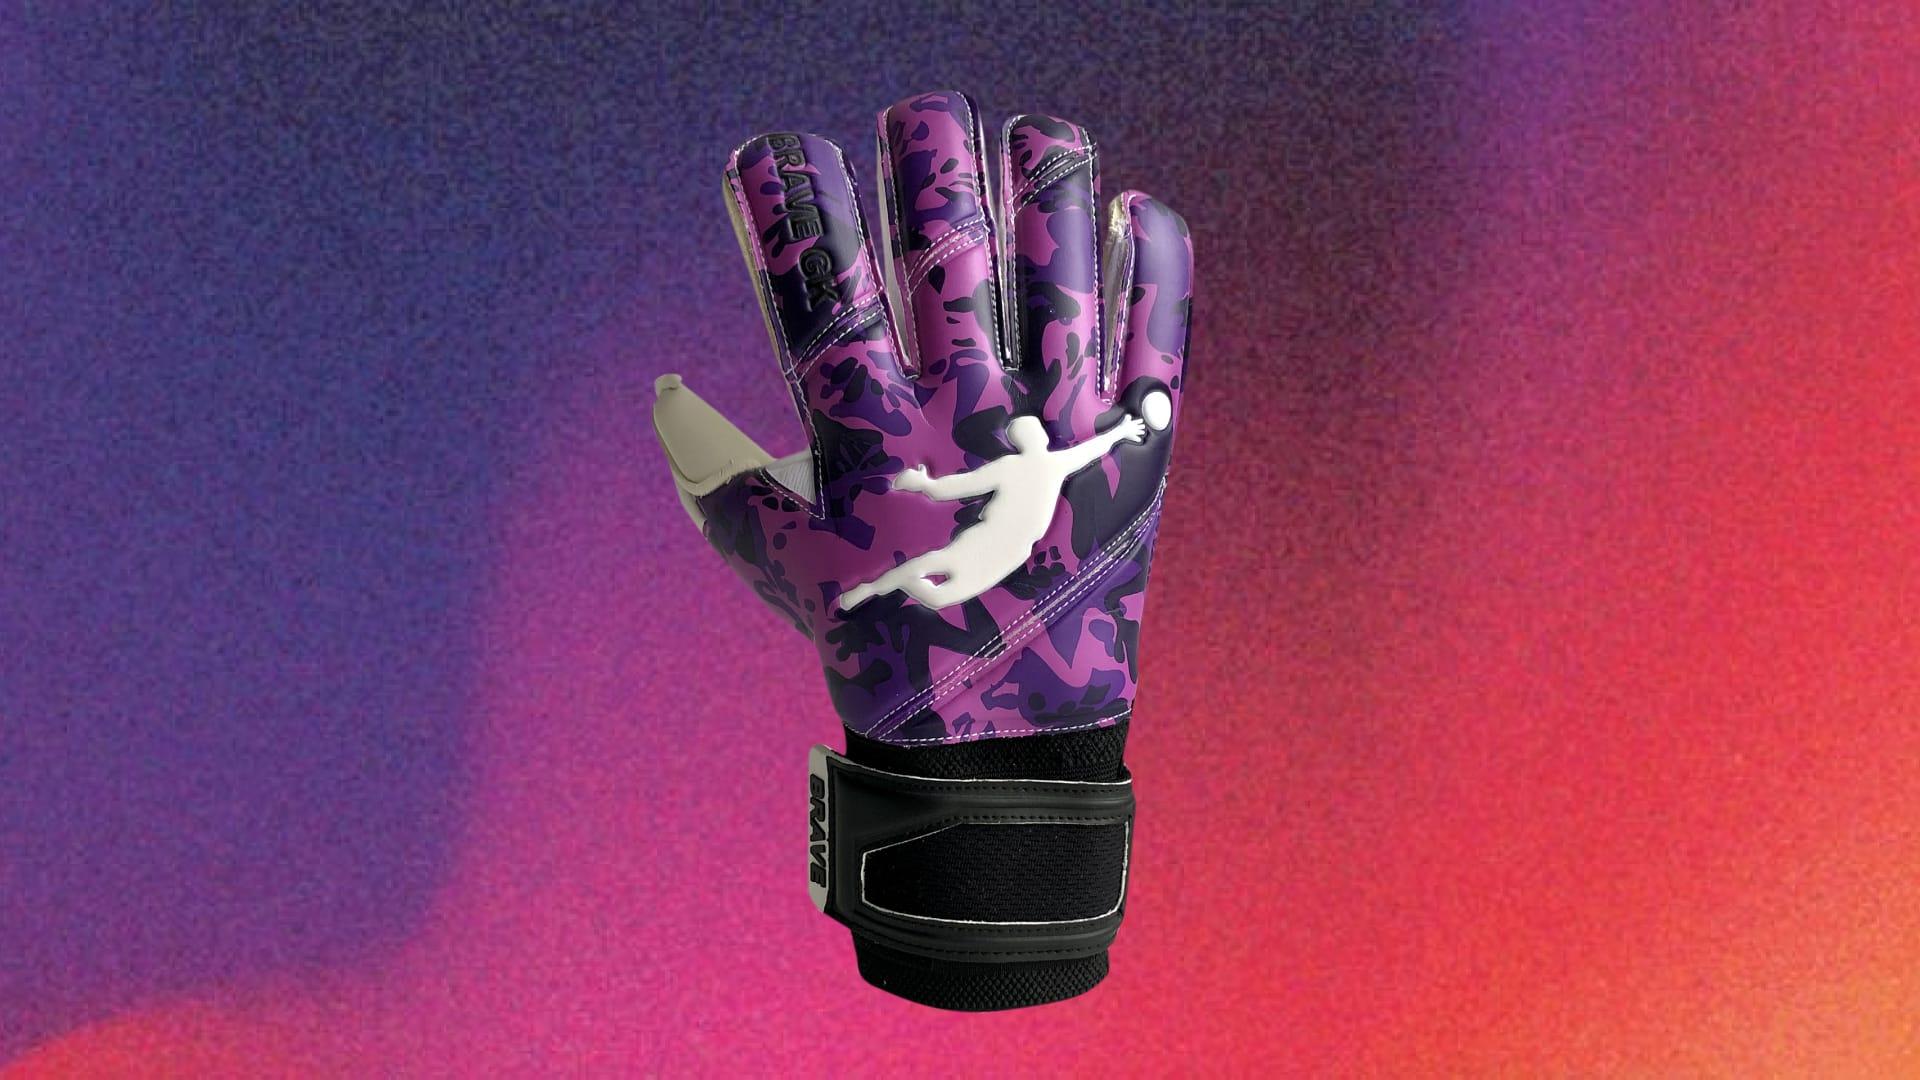 Brave GK Reflex Camo Purple - офіційний інтернет-магазин Brave GK